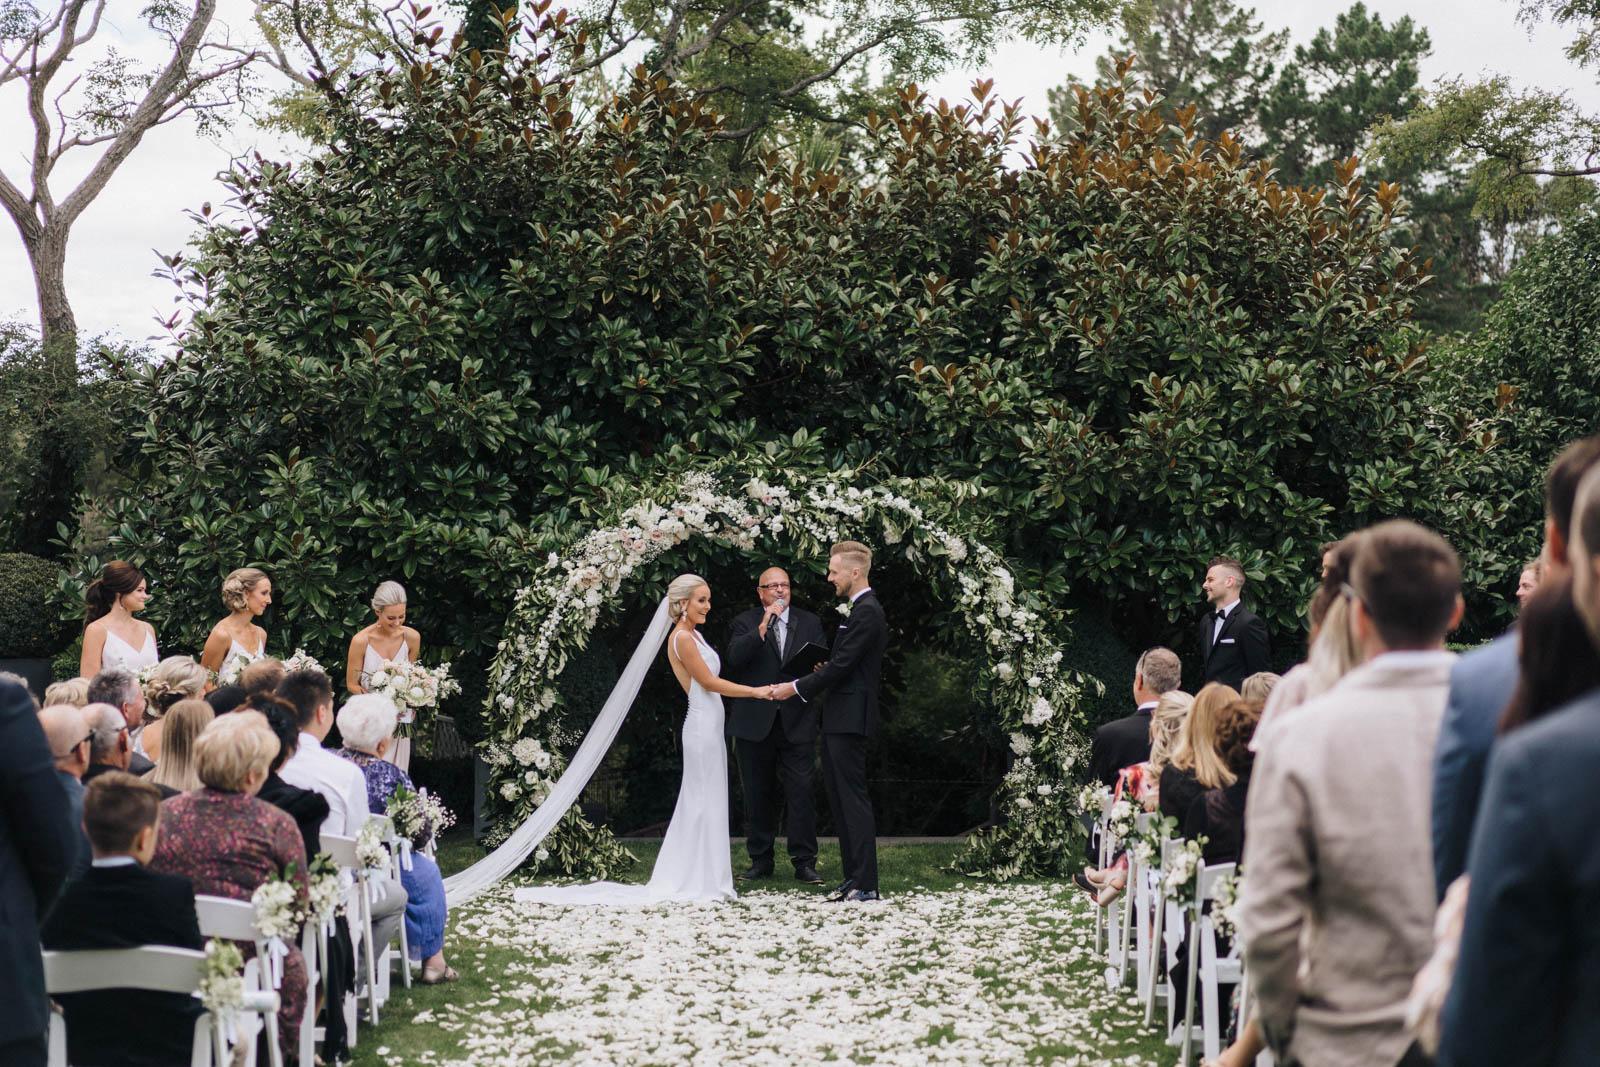 newfound-k-s-hilton-taupo-wedding-photographer-031